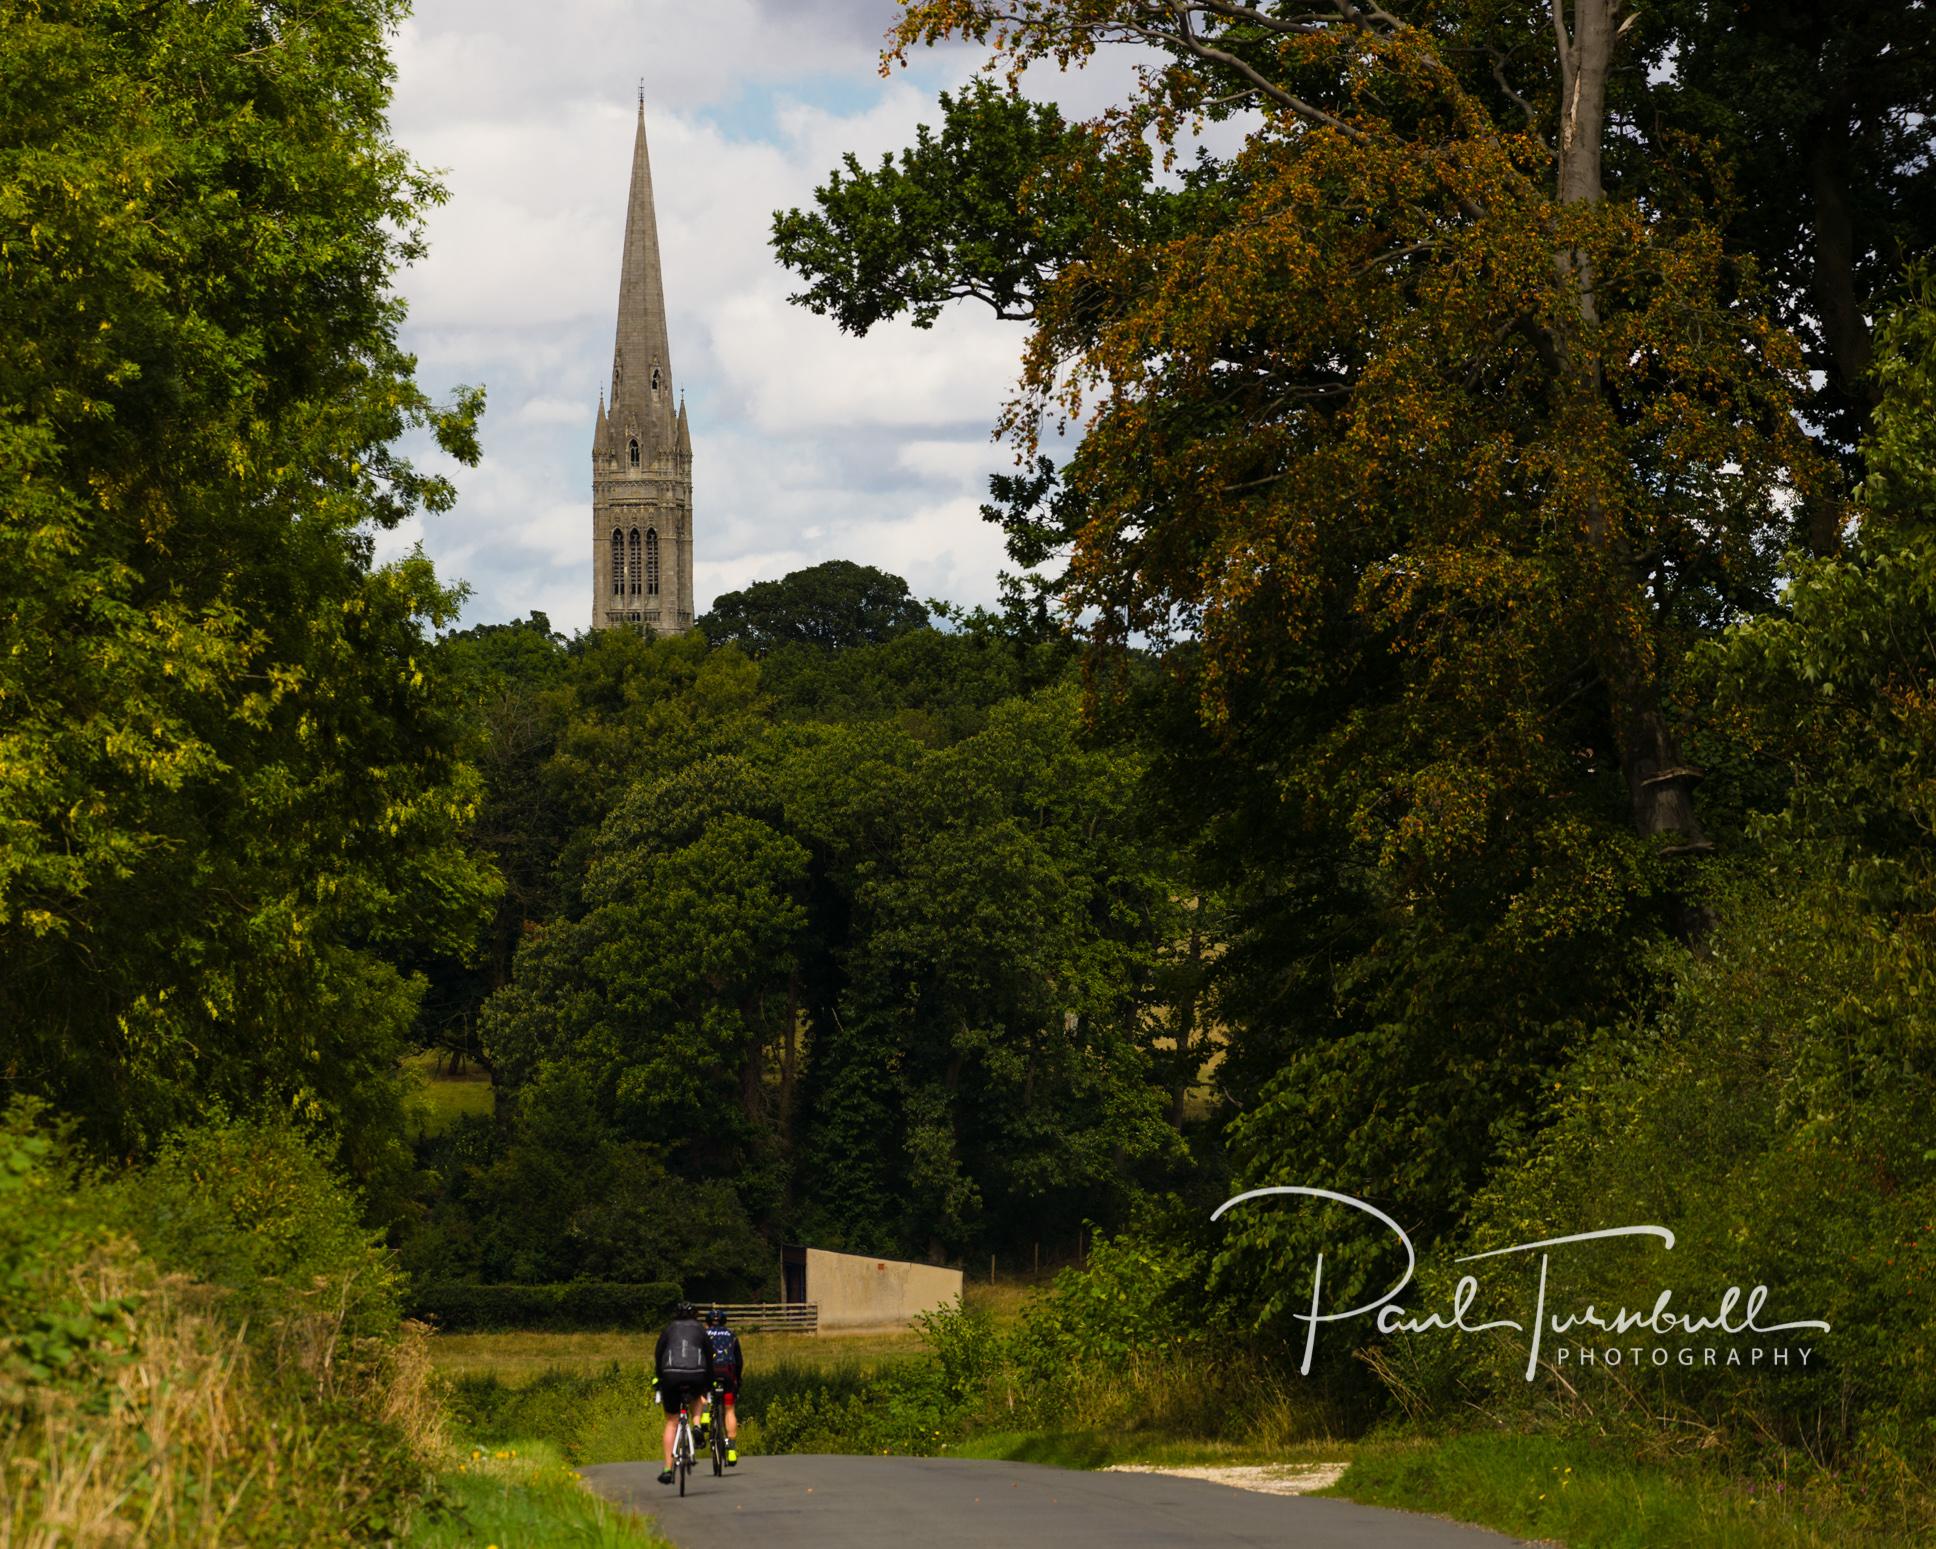 wedding-photographer-south-dalton-walkington-yorkshire-emma-james-026.jpg